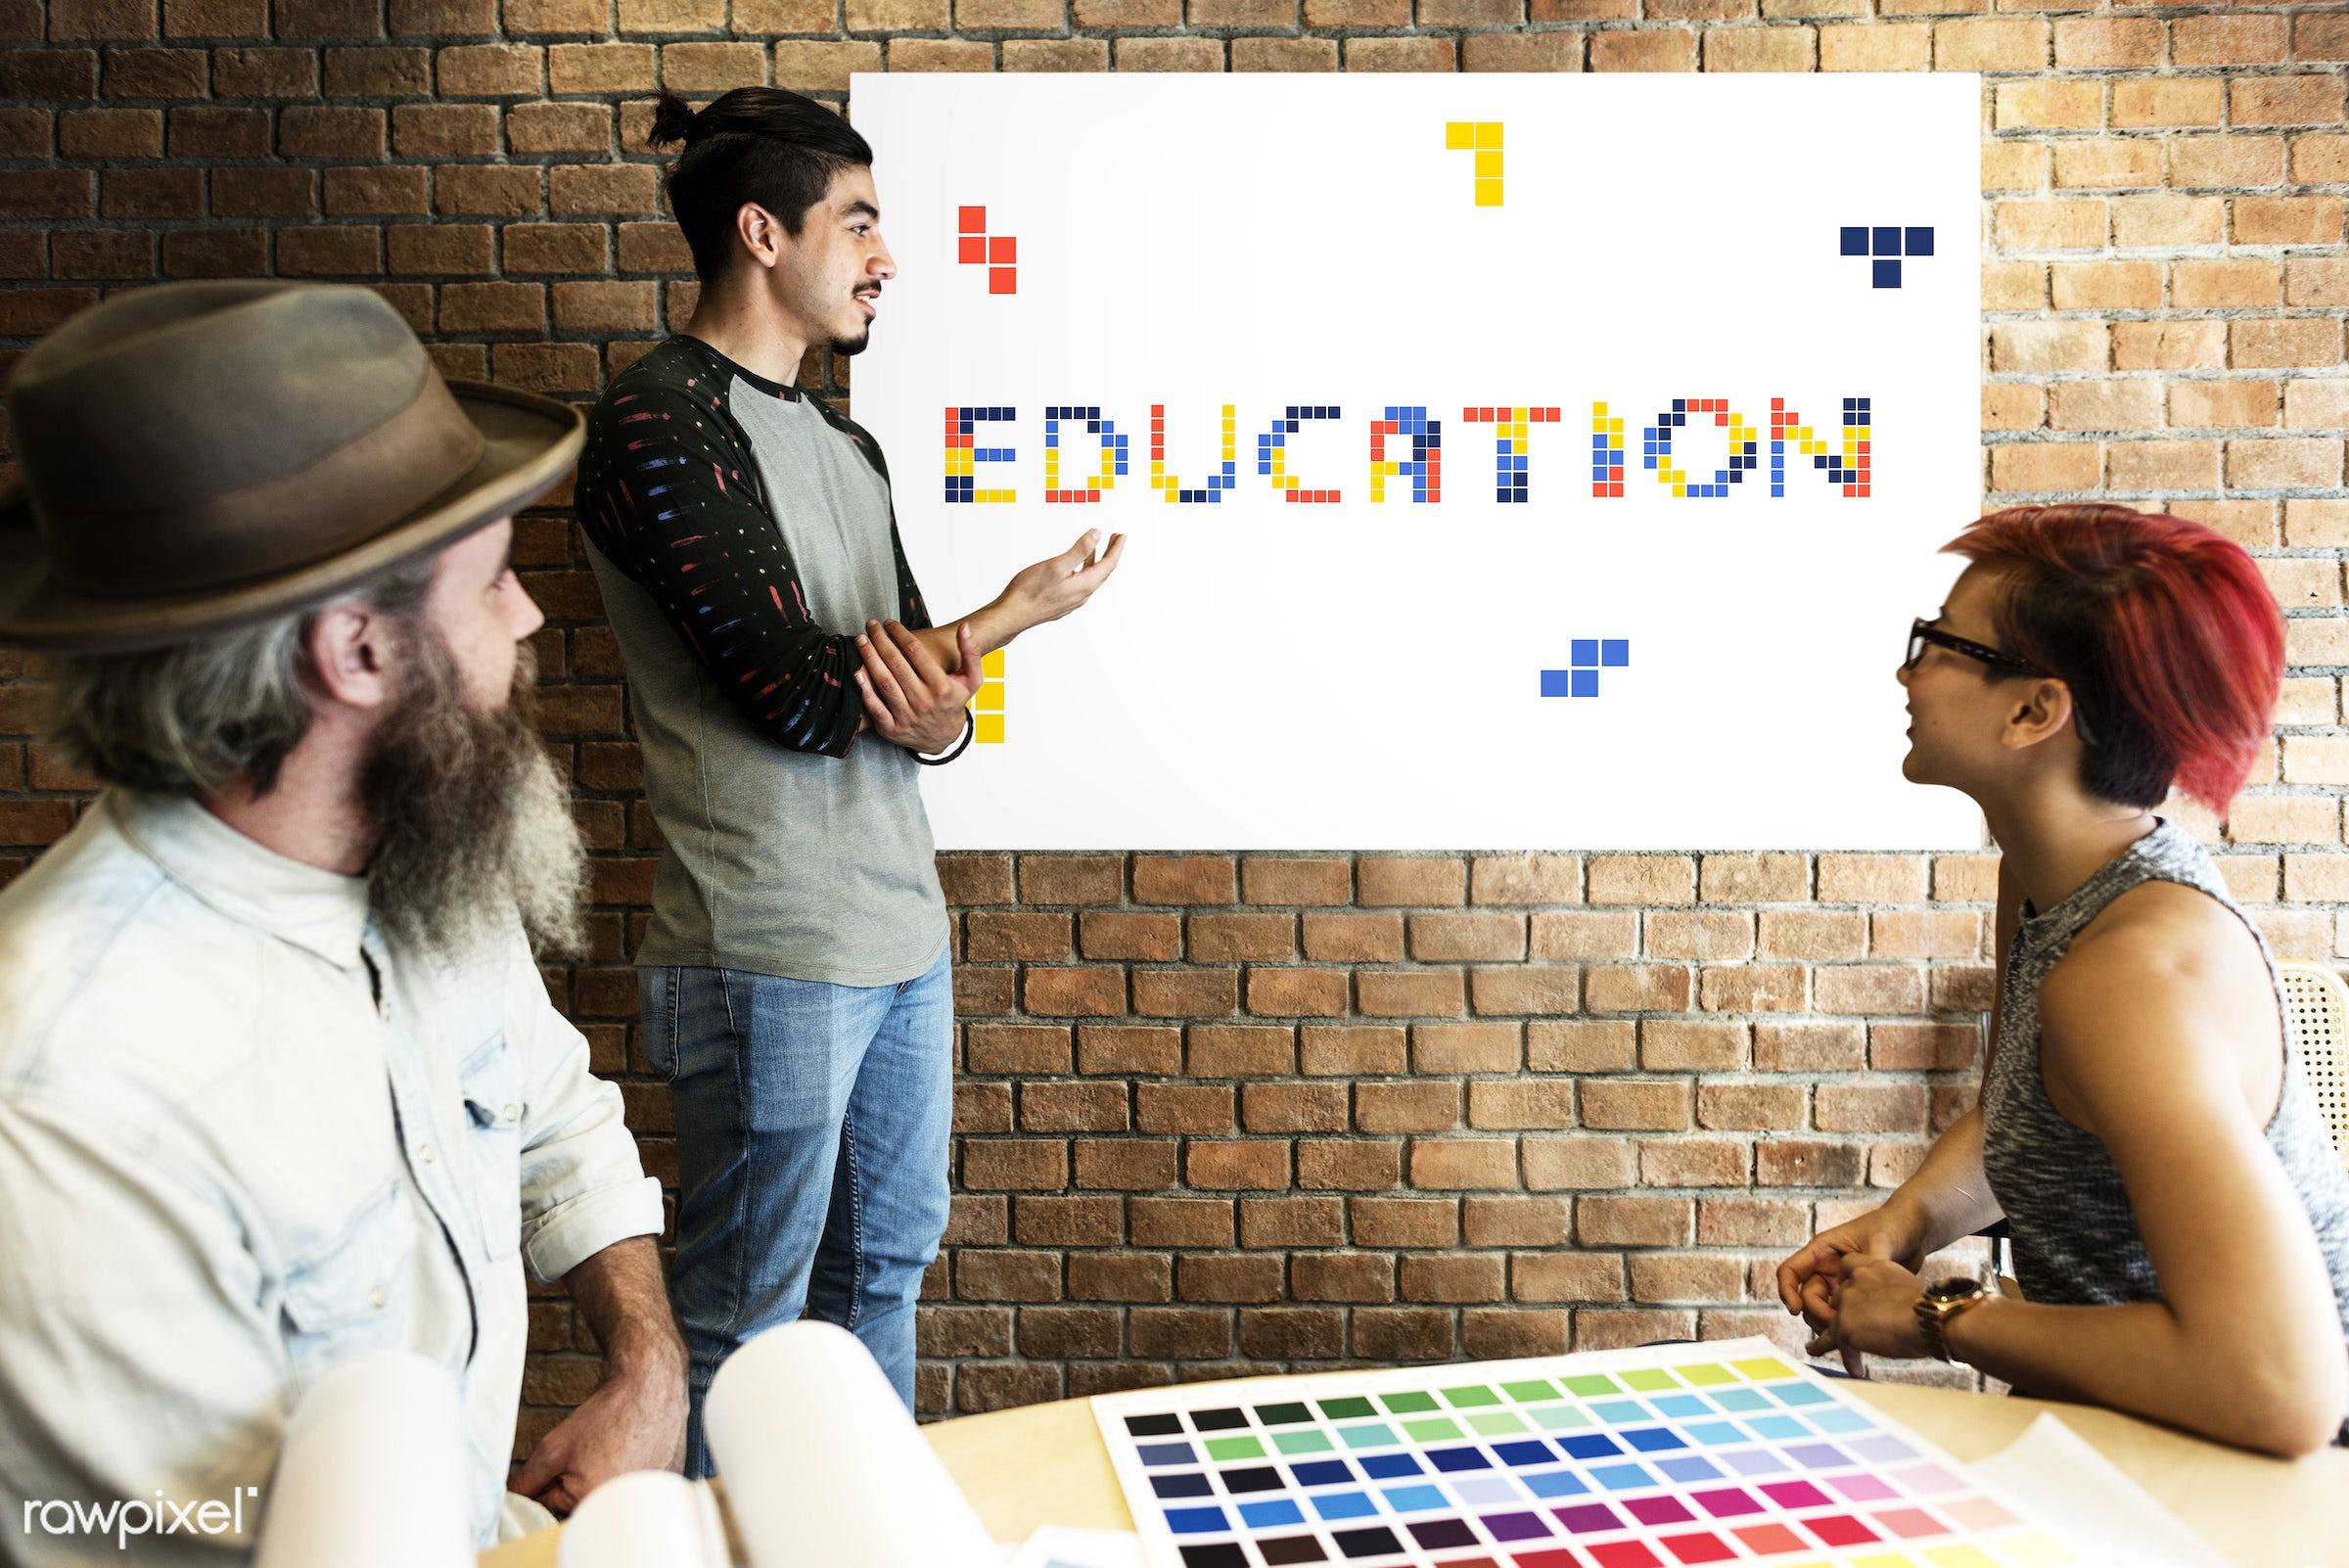 8 bit, academics, art, beard, block, board, brick wall, chart, color chart, colors, design, discussion, education, female,...